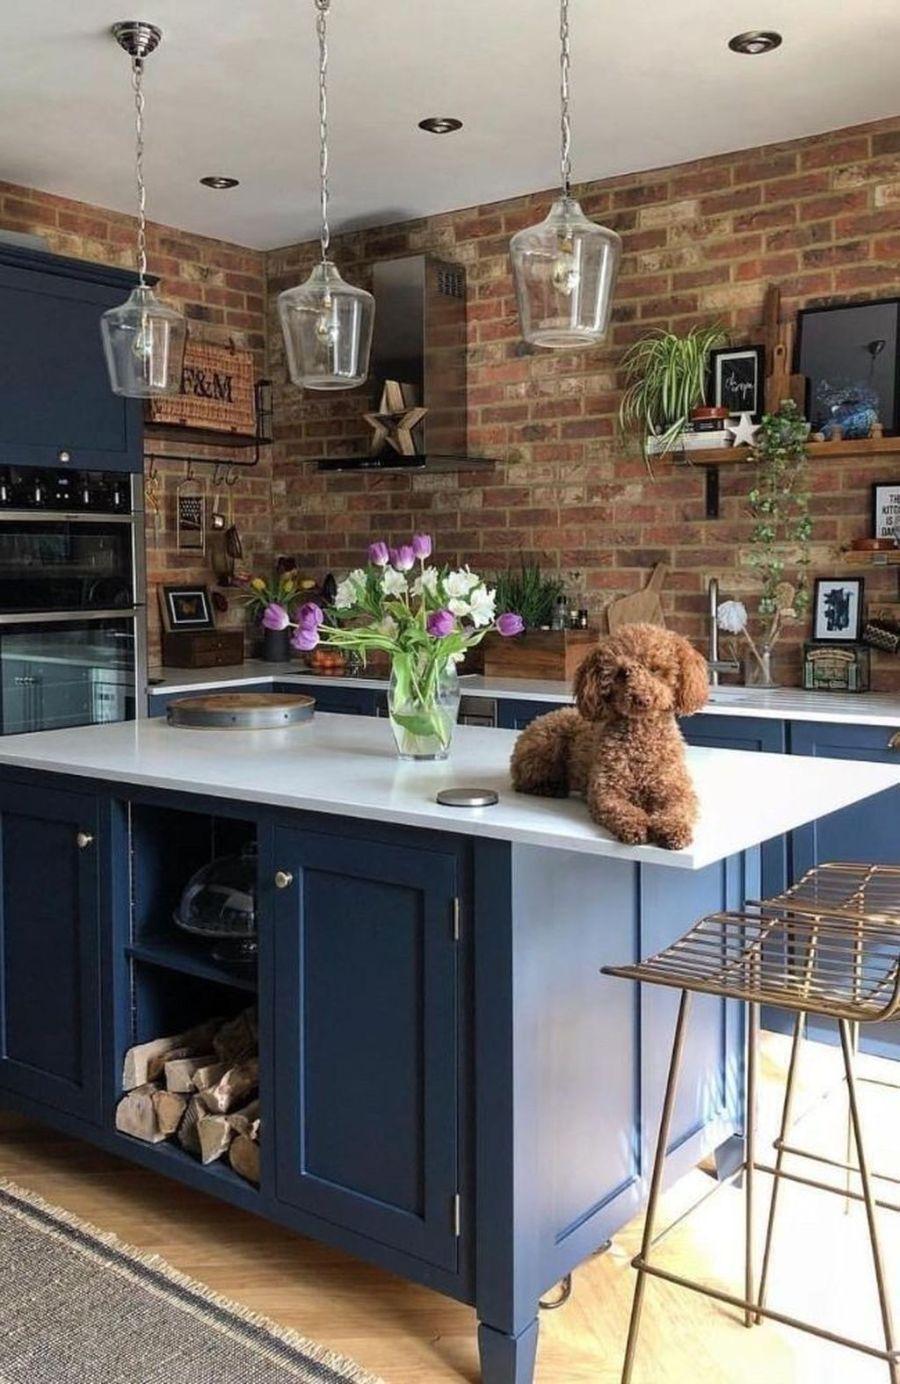 10x10 Bedroom Layout Ikea: 35 Popular Kitchen Lighting Ideas - SearcHomee